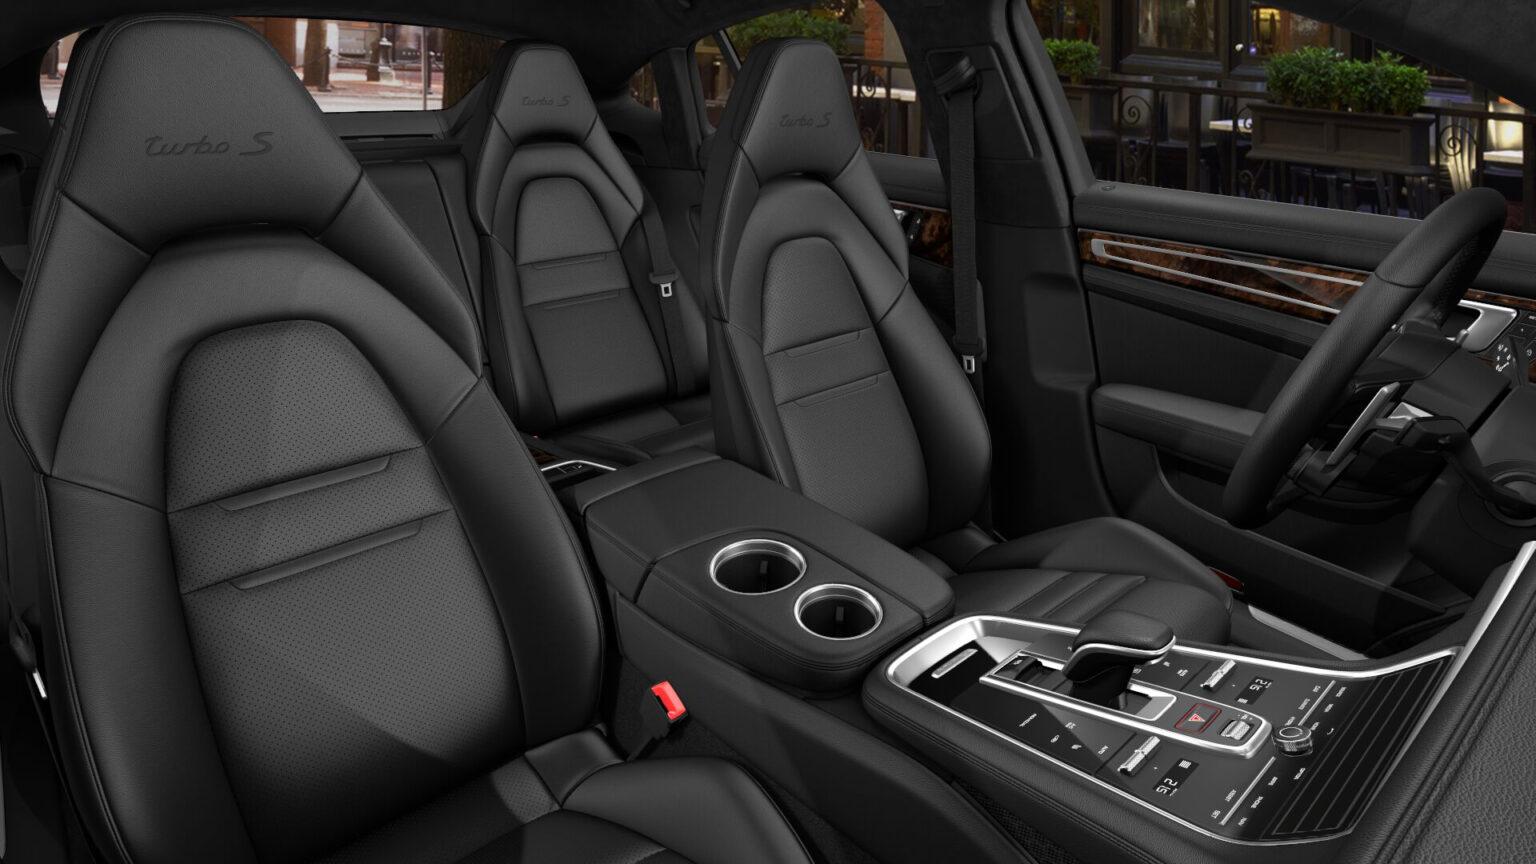 Porsche Panamera Turbo S E Hybrid Interior 02